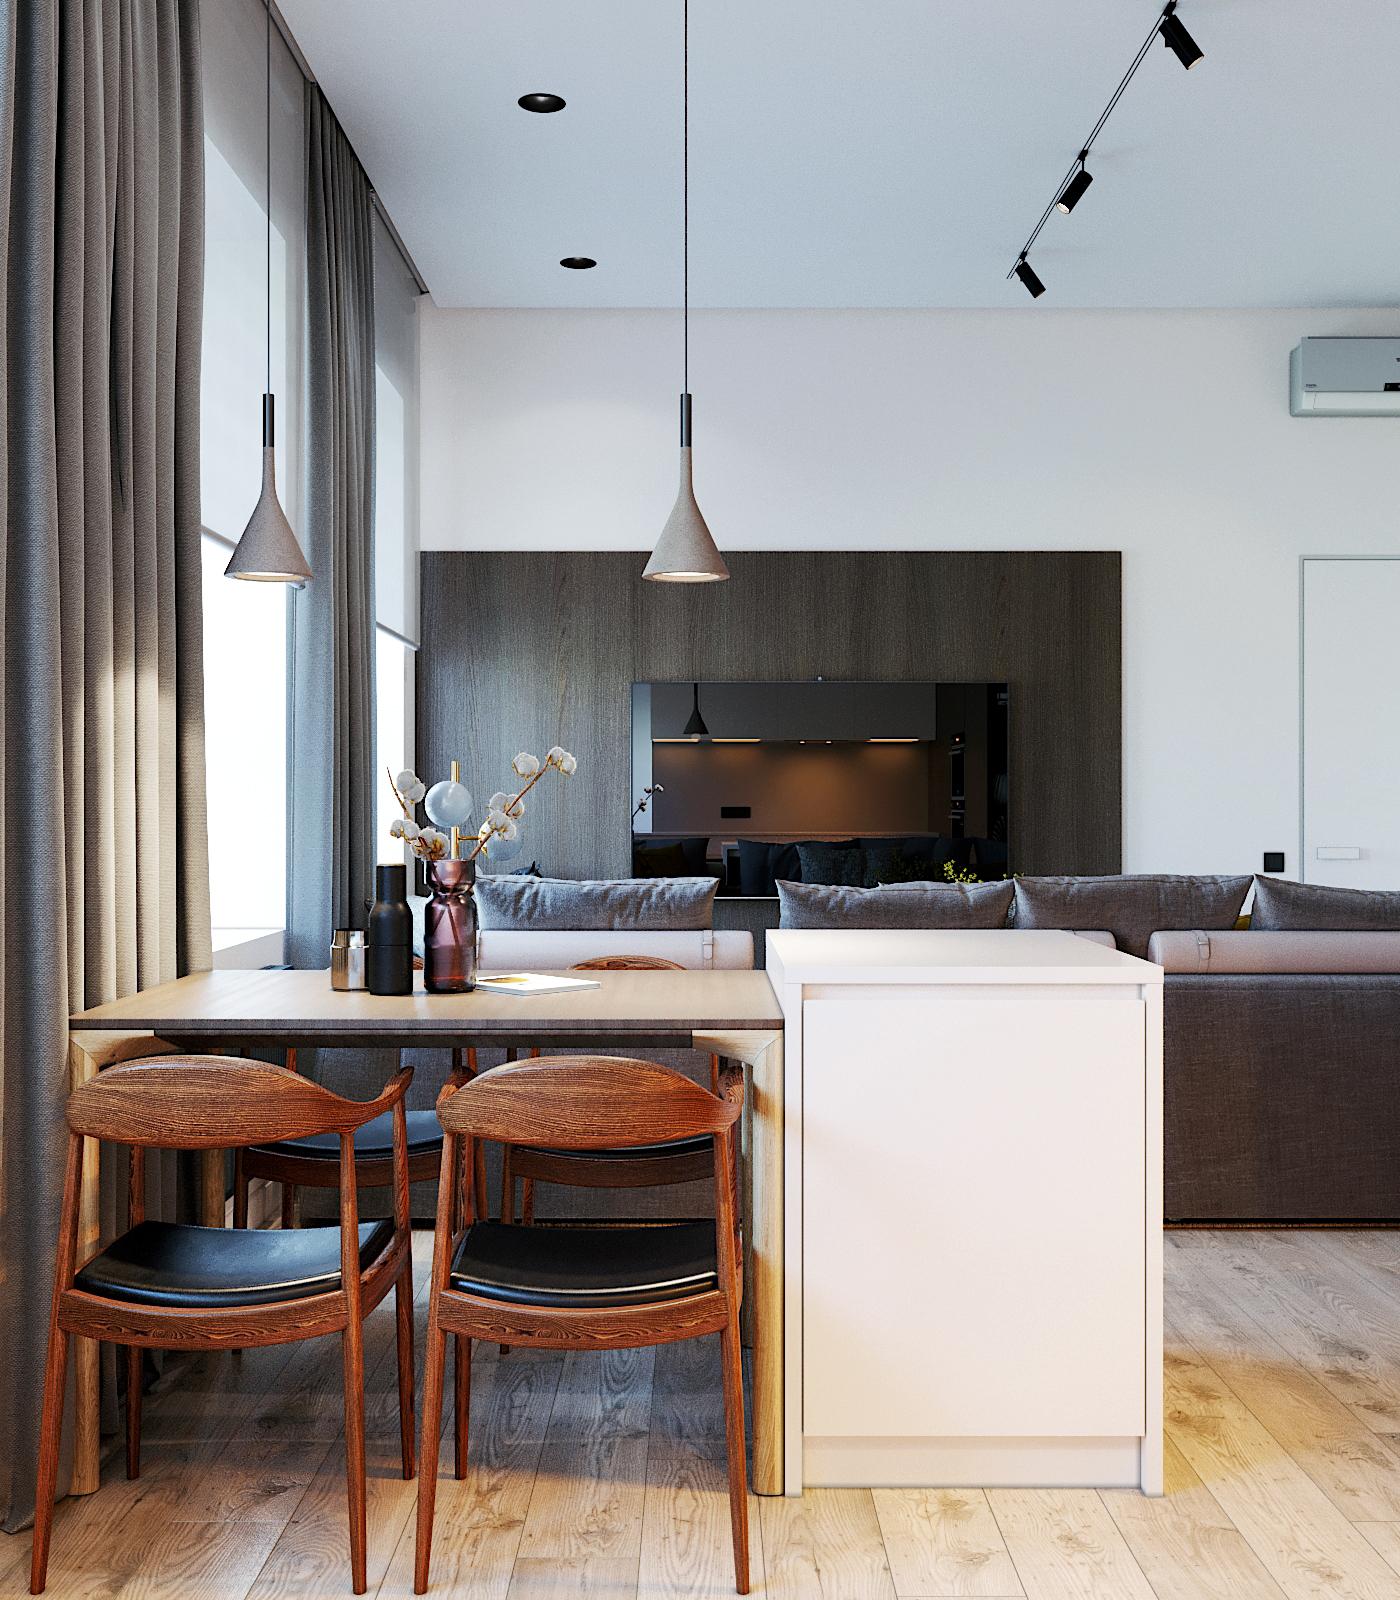 https://avantum-remont.ru/wp-content/uploads/2015/05/Livingroom-Kitchen_Interactive-LightMix_View11.jpg